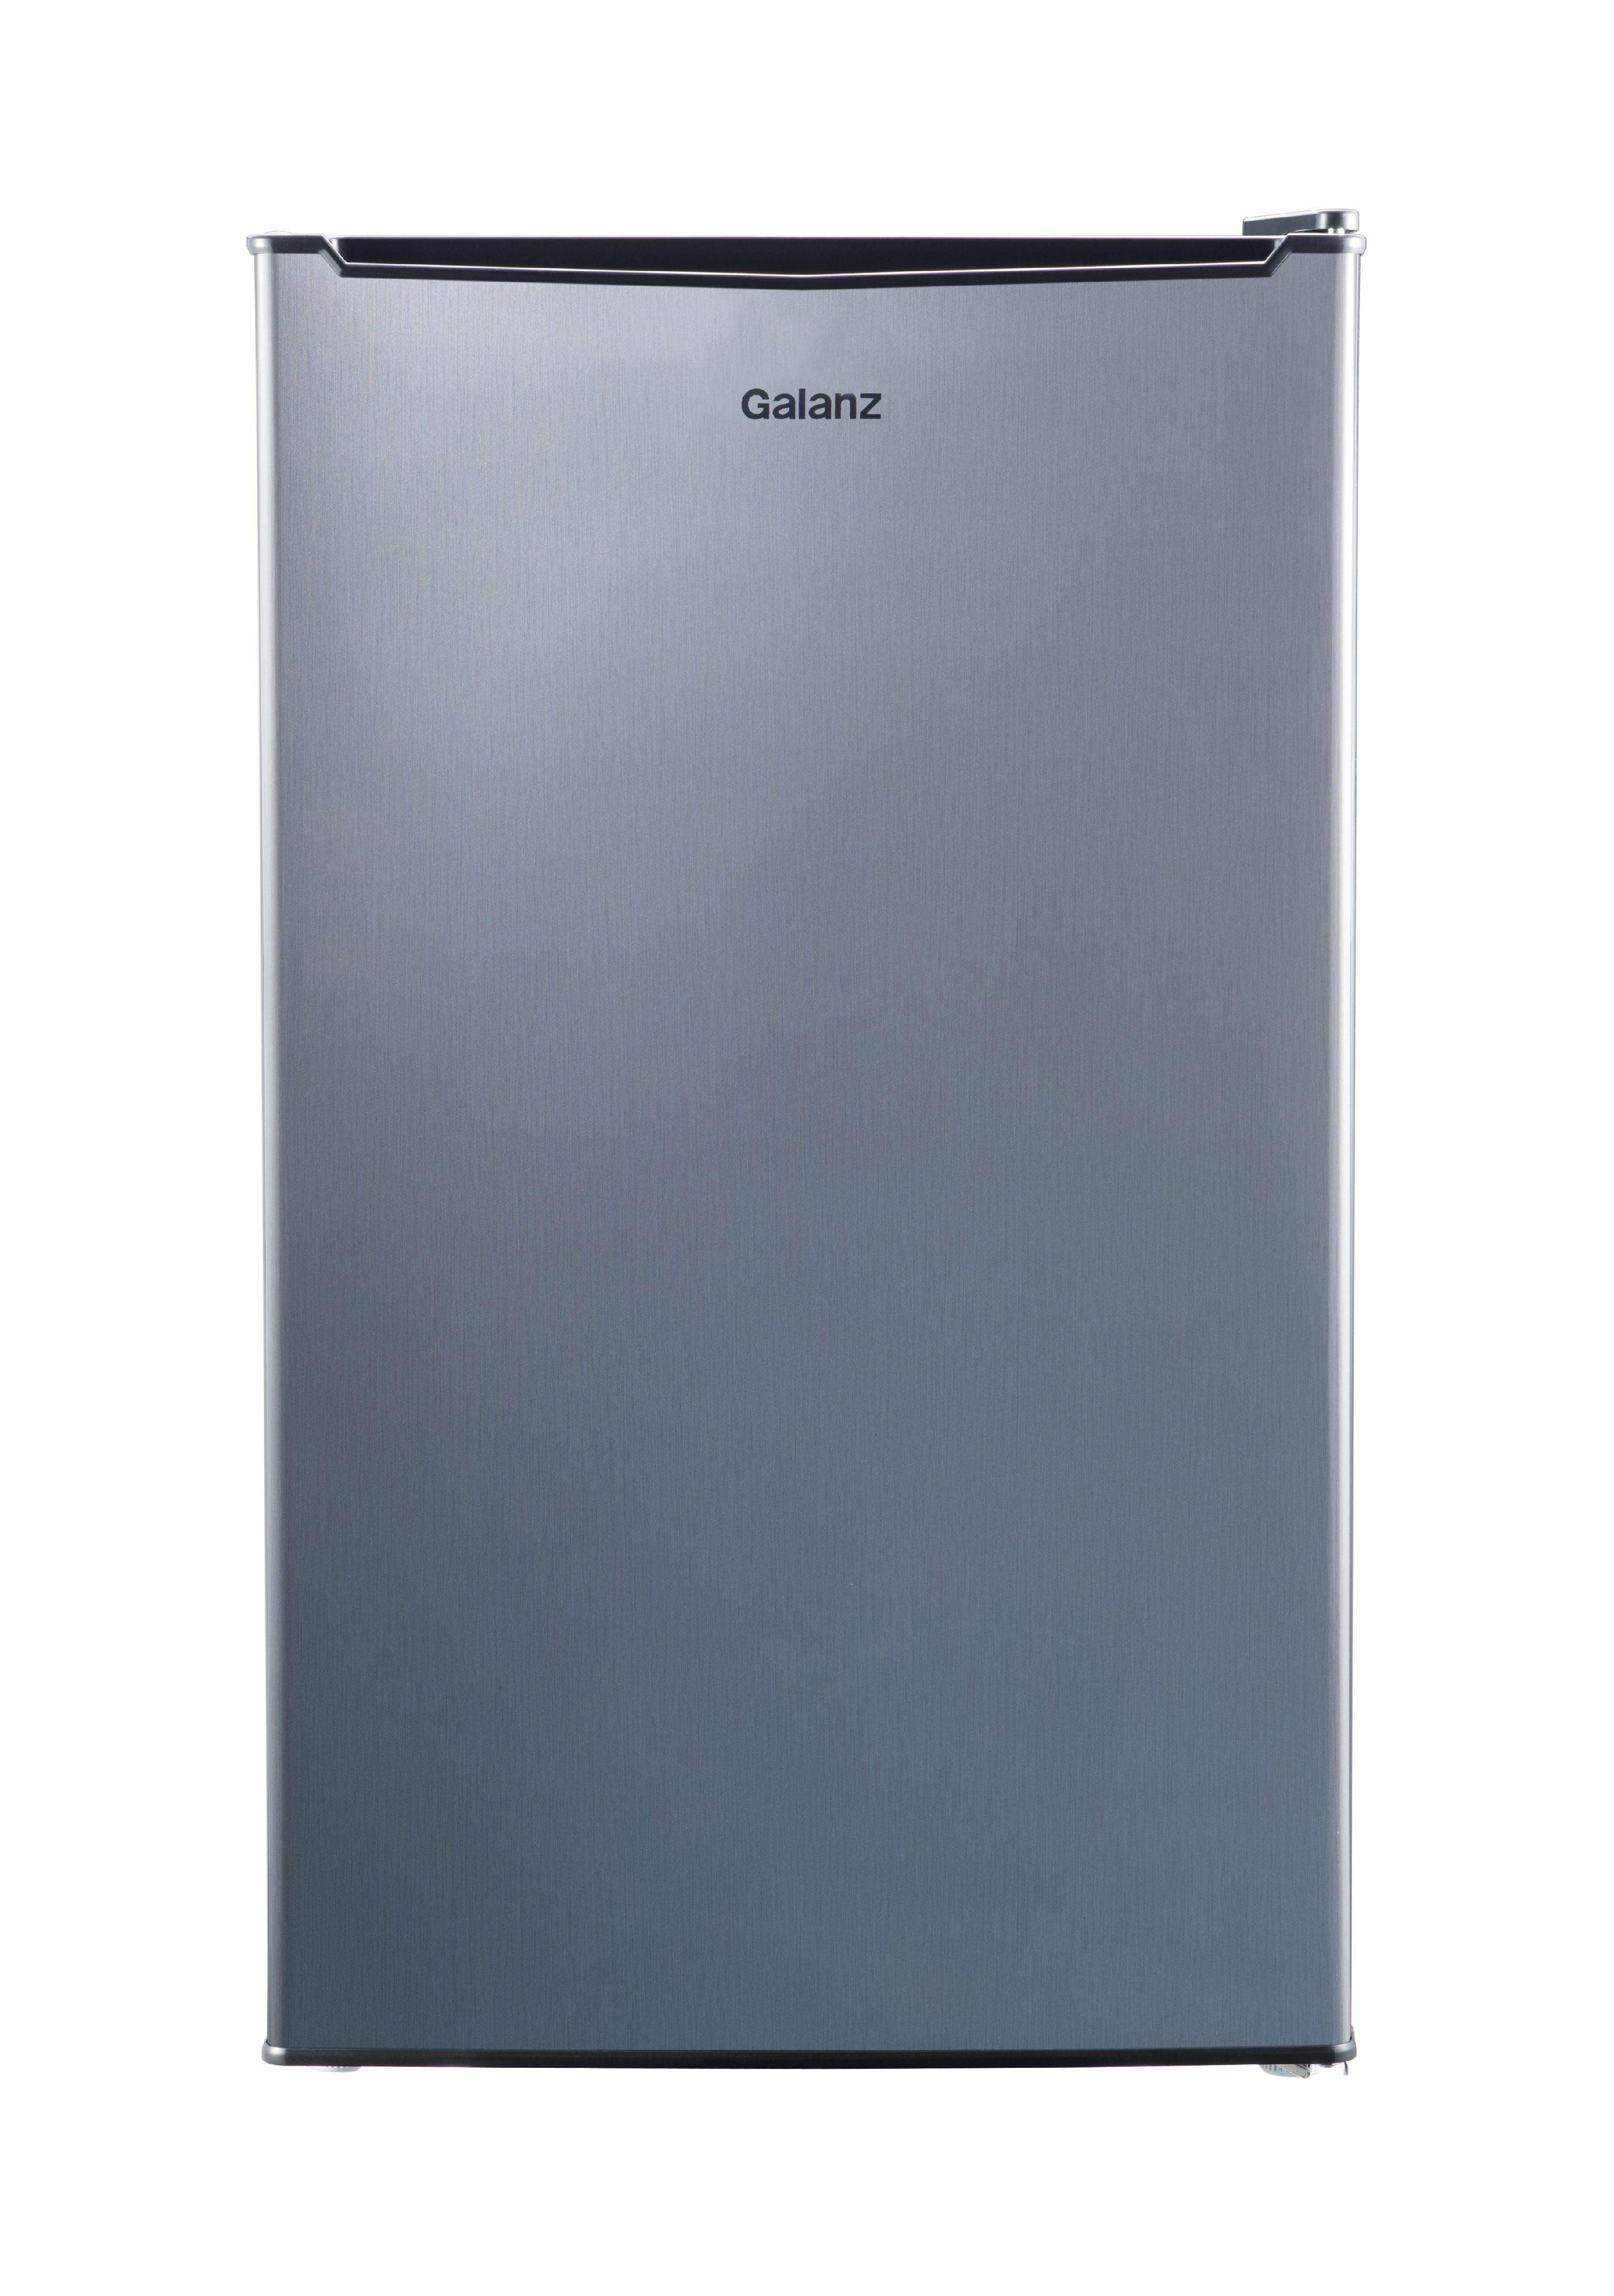 Galanz 3.5 Cu Ft Single Door Mini Fridge GL35S5, Stainless